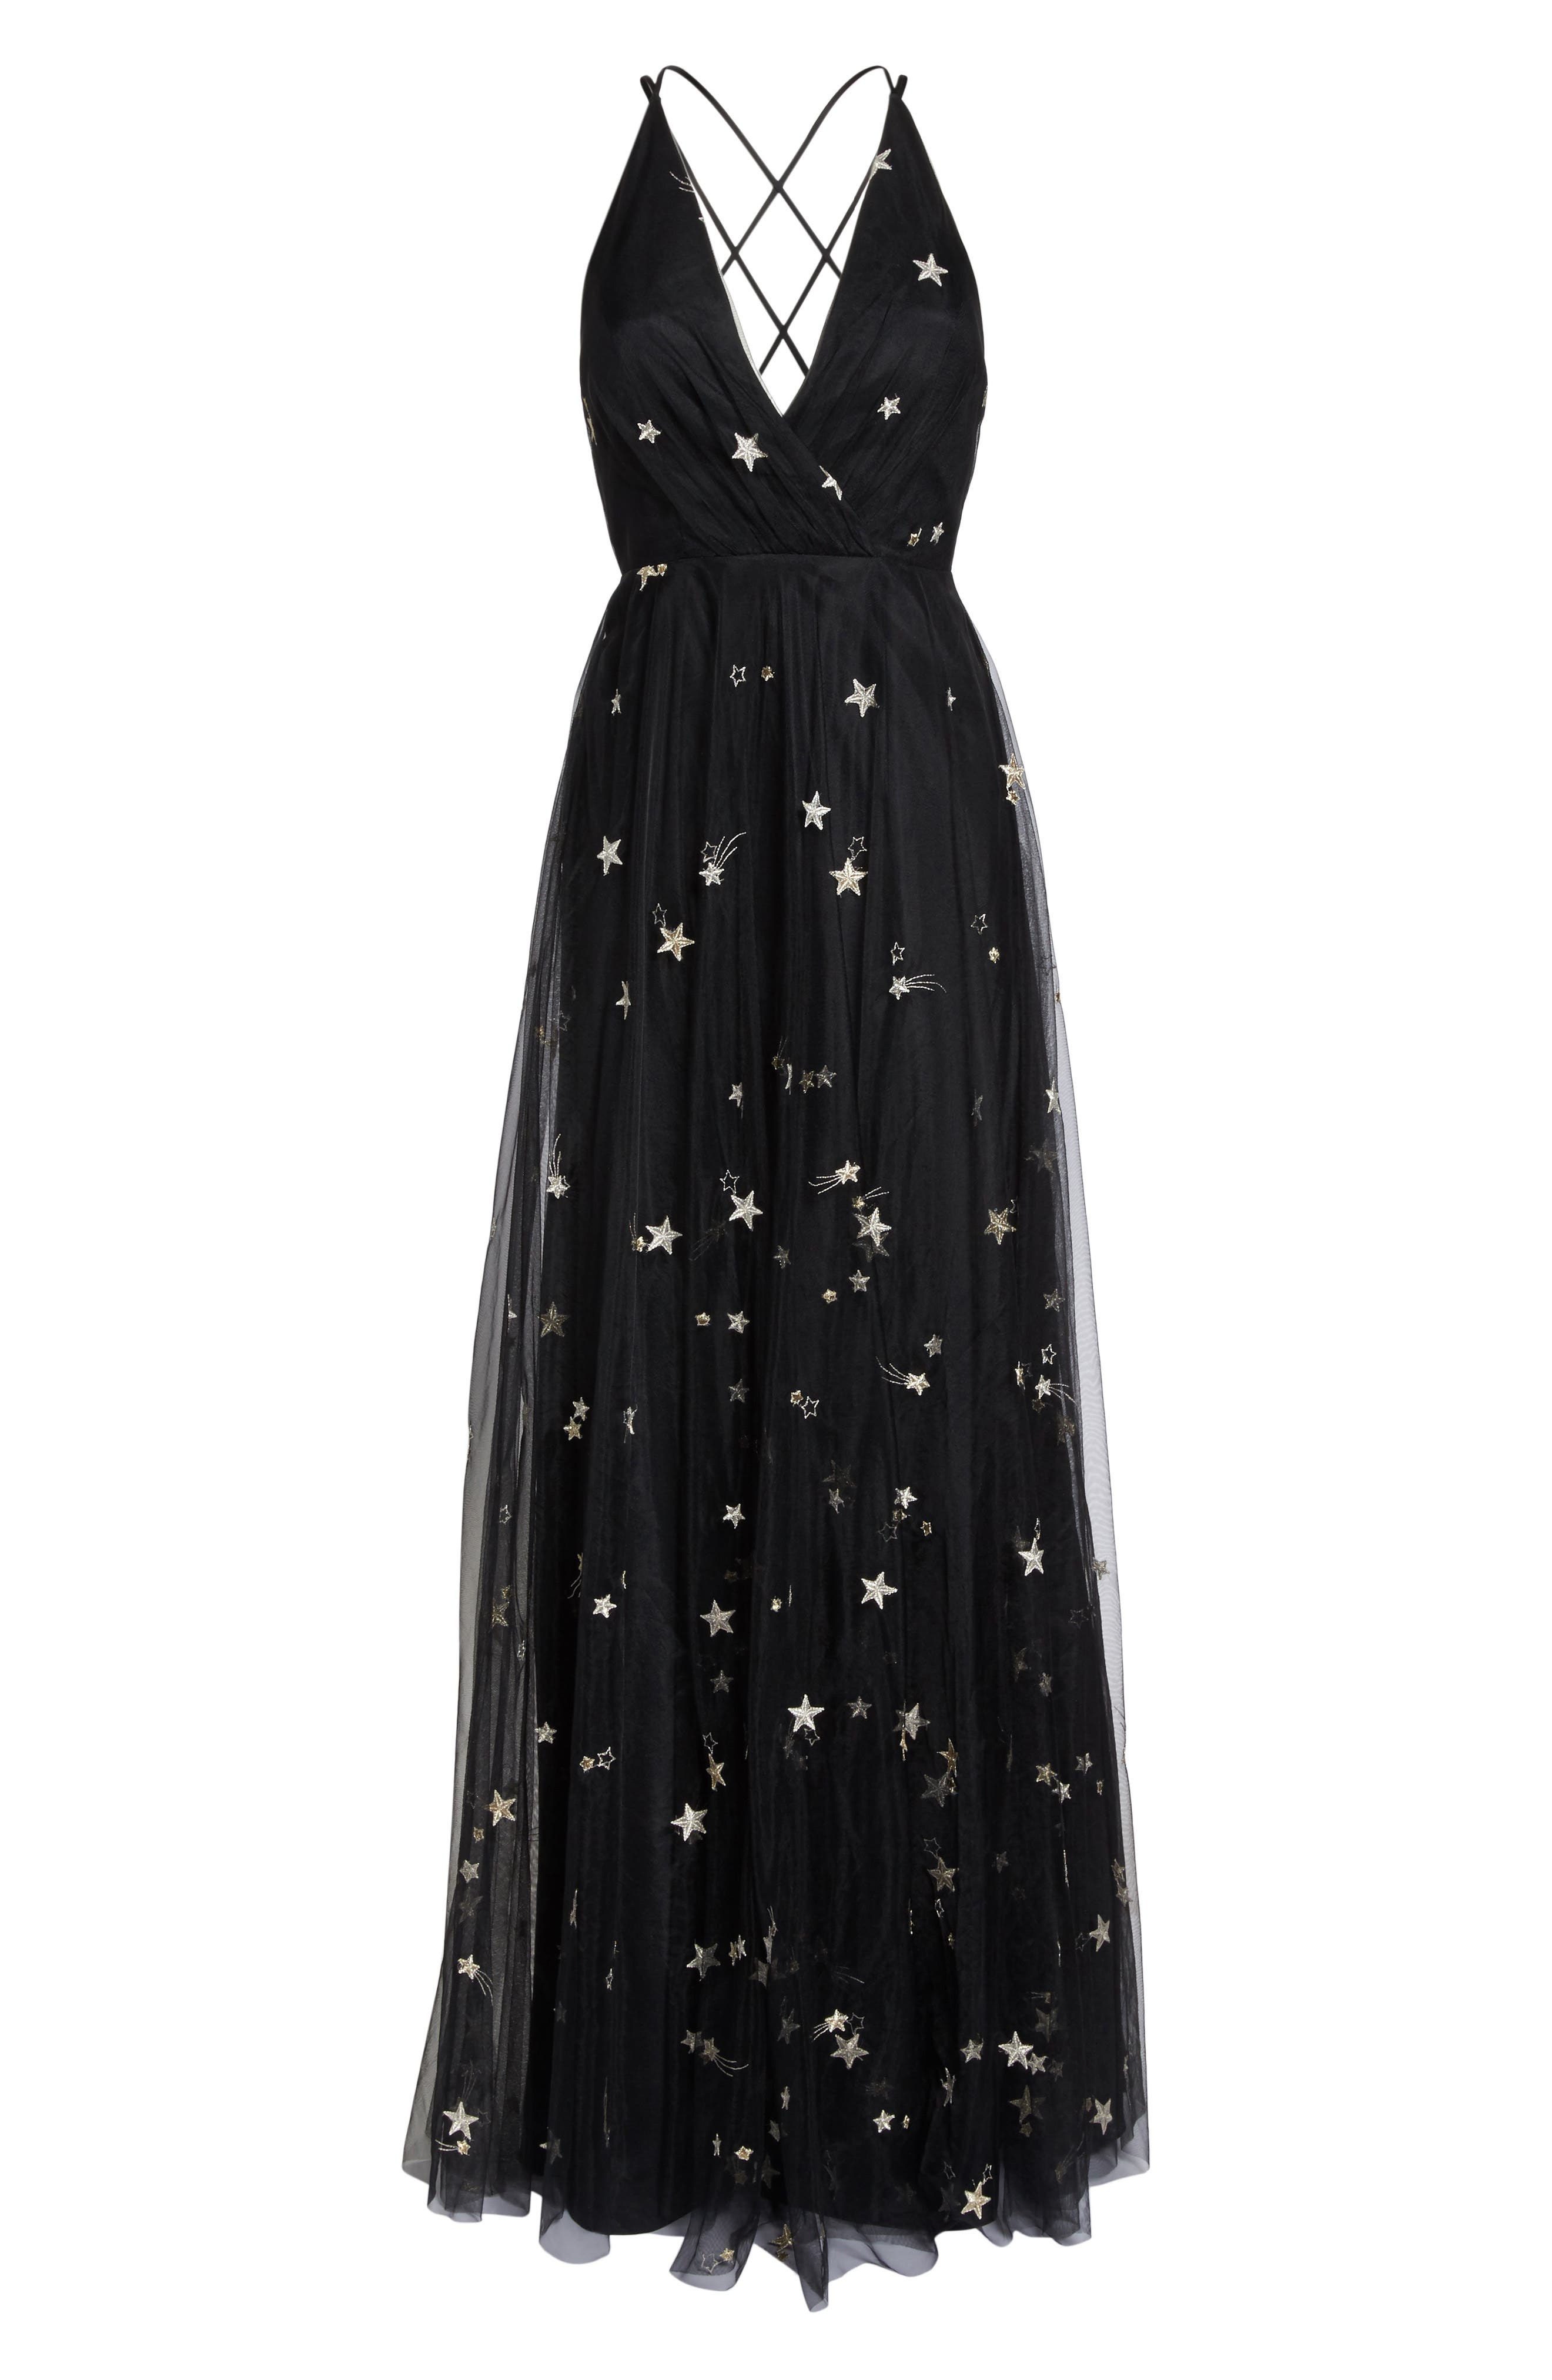 Chelsea Starry Night Embroidered Halter Maxi Dress,                             Alternate thumbnail 6, color,                             Black/ Metallic